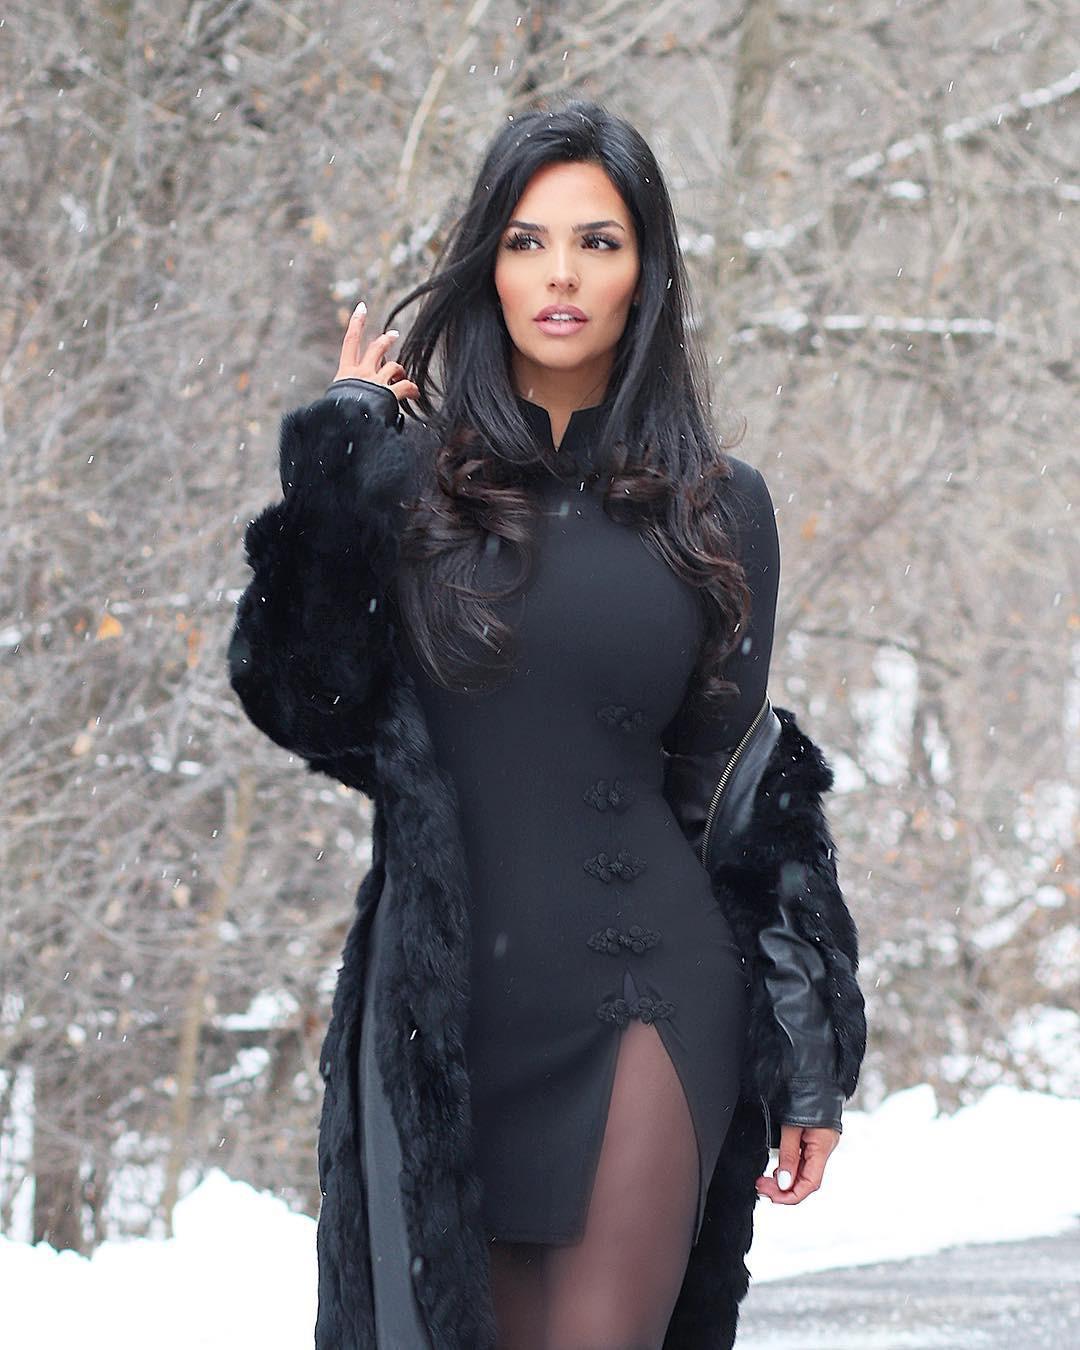 Shadi Y Cair woman thighs, hot legs, Natural Black Hair